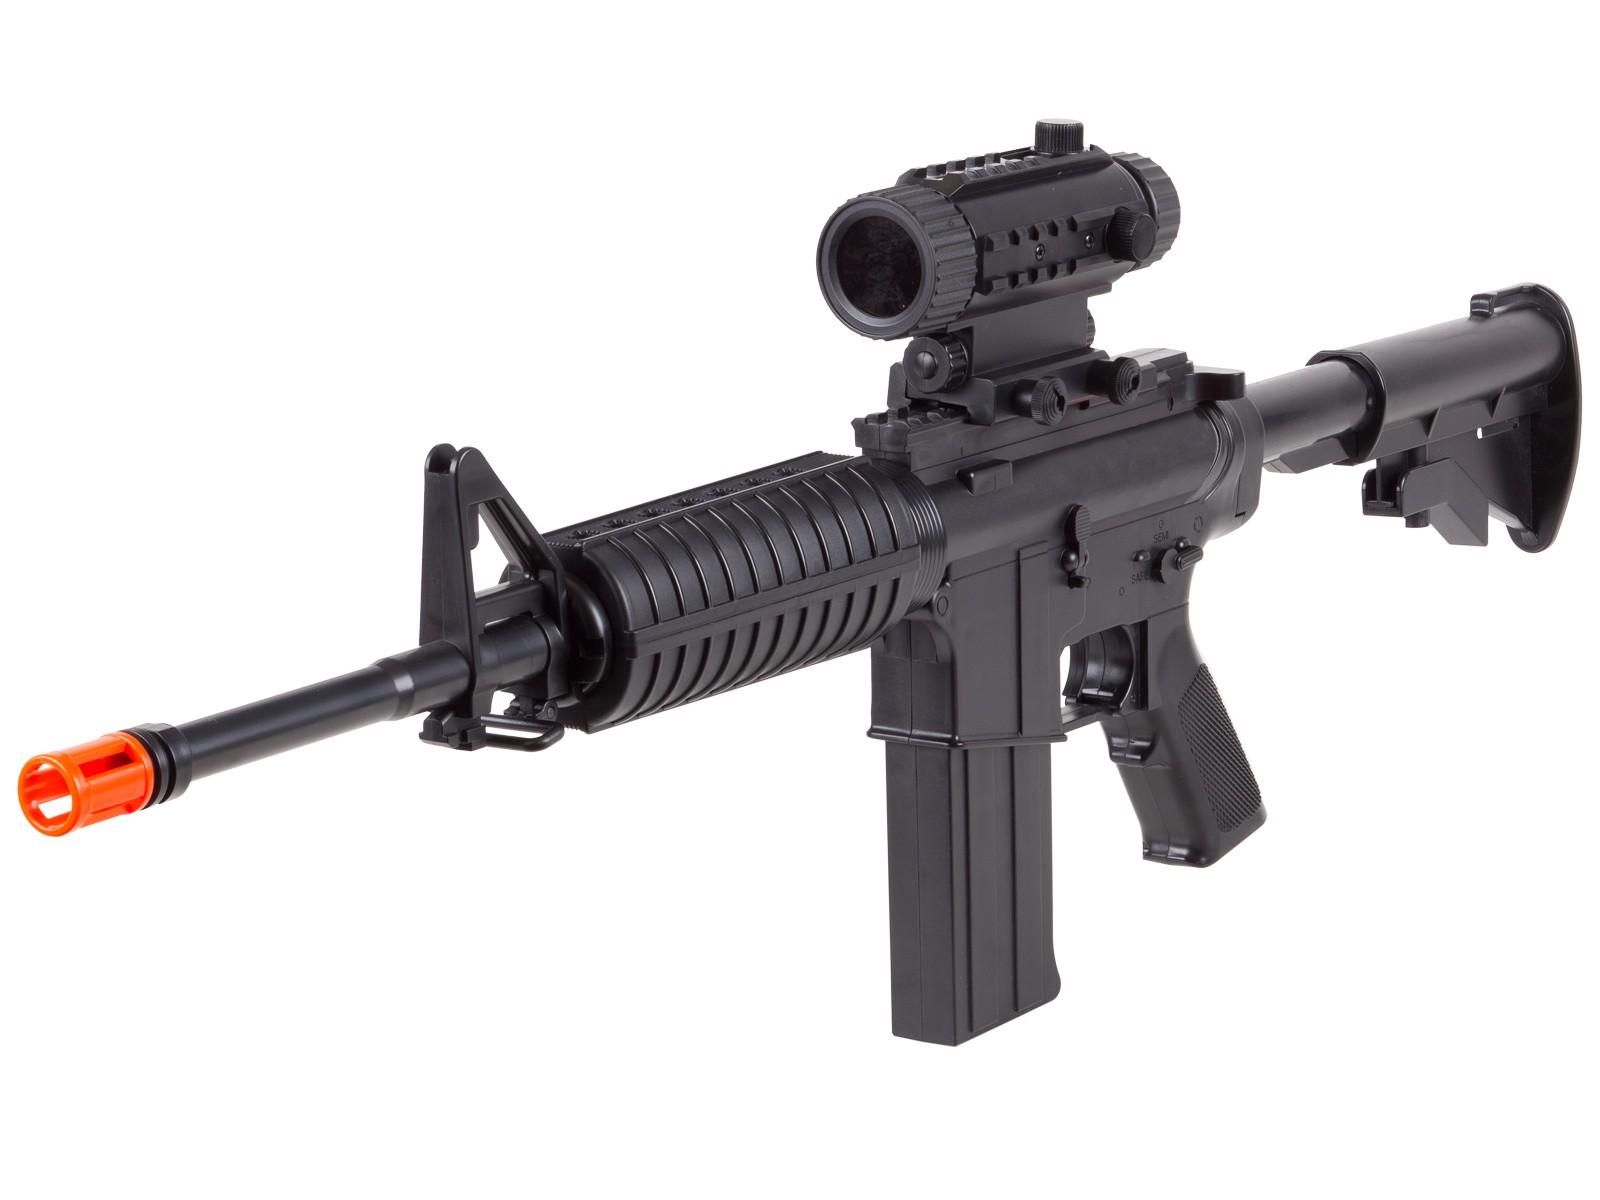 Firepower_M4_BOYS_Electric_Rifle_Black_6mm